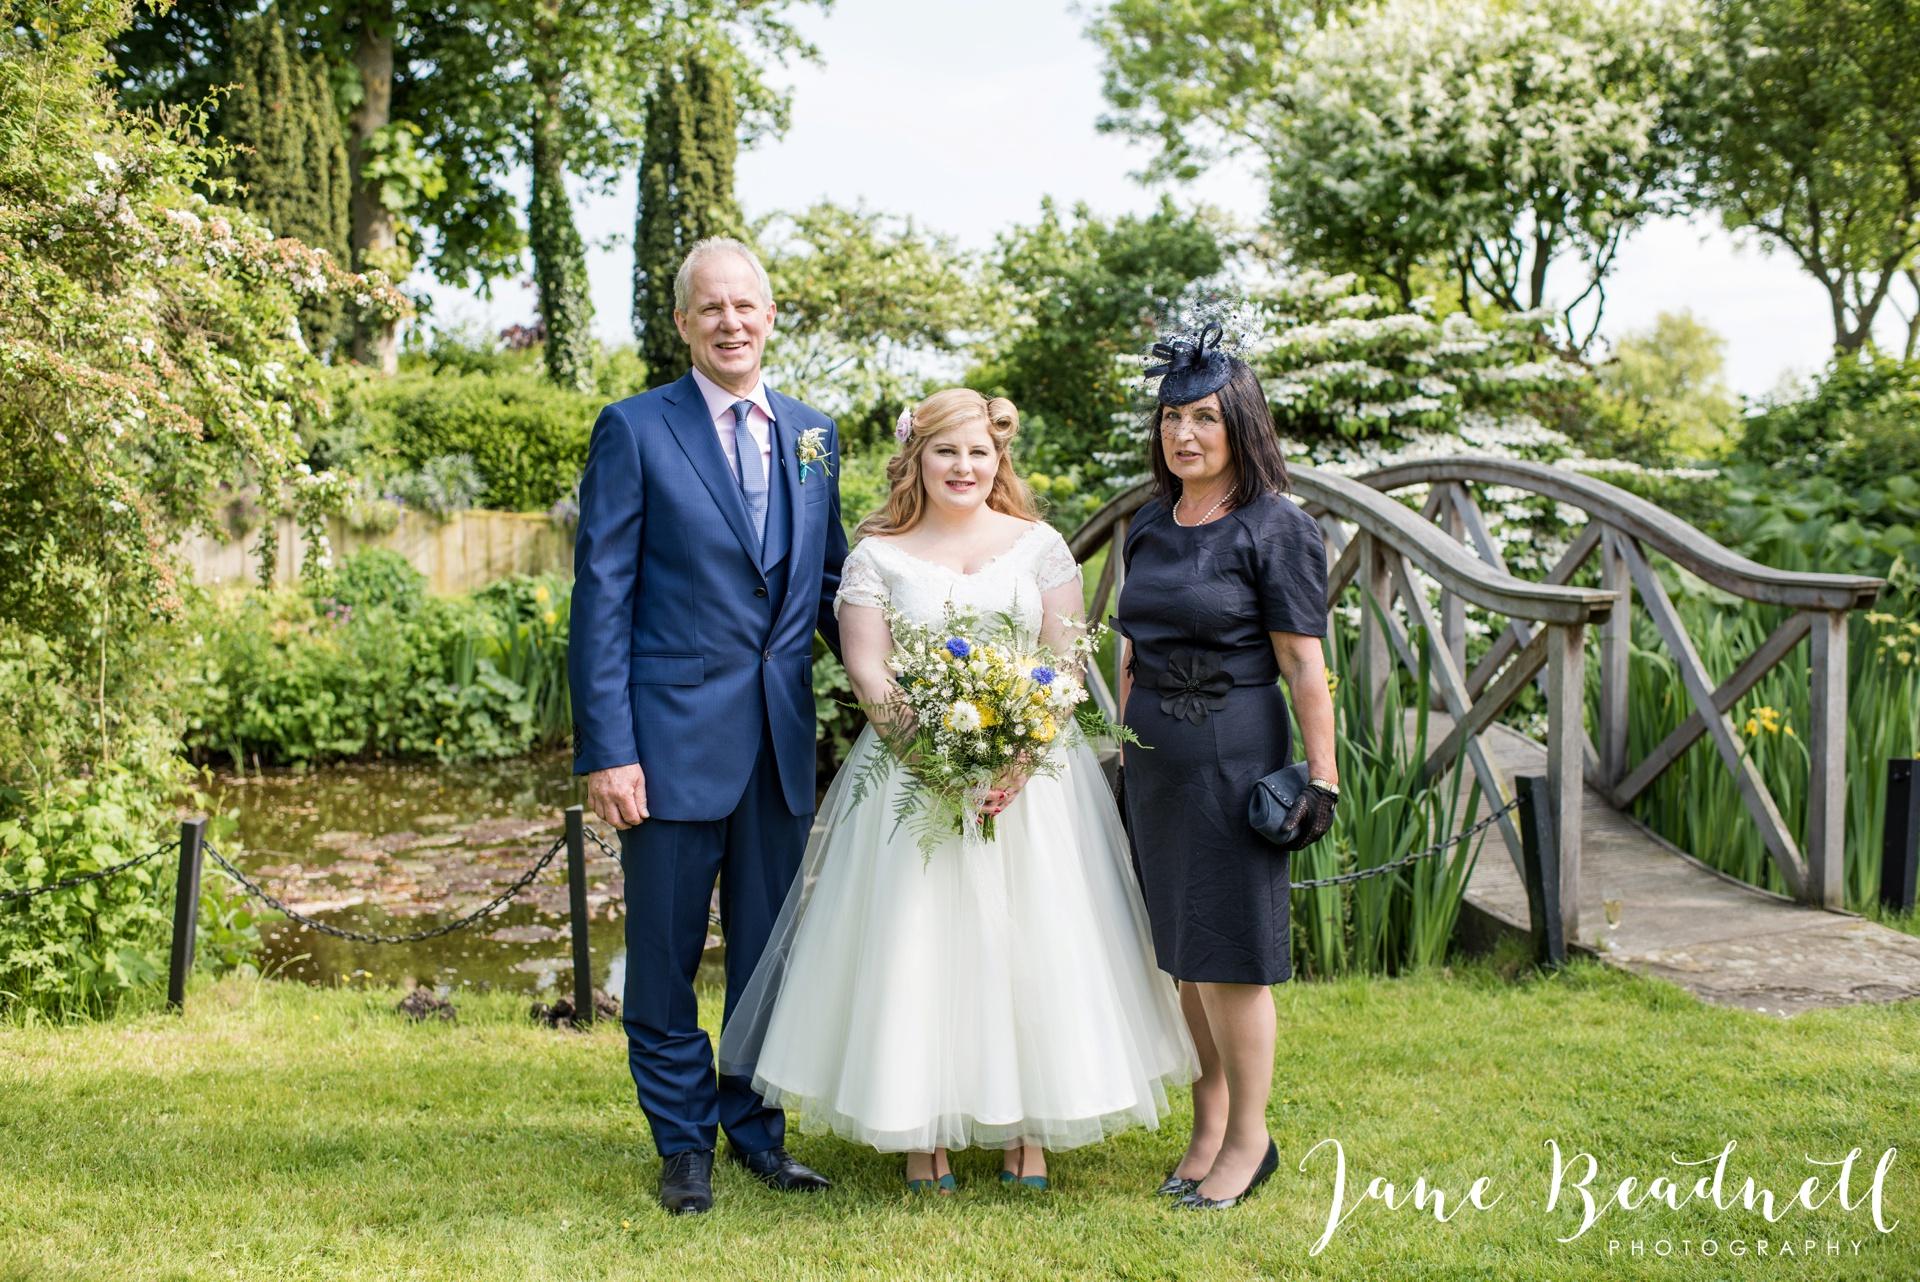 South Farm Wedding photography Hertfordshire by Jane Beadnell Photography fine art wedding photographer_0091